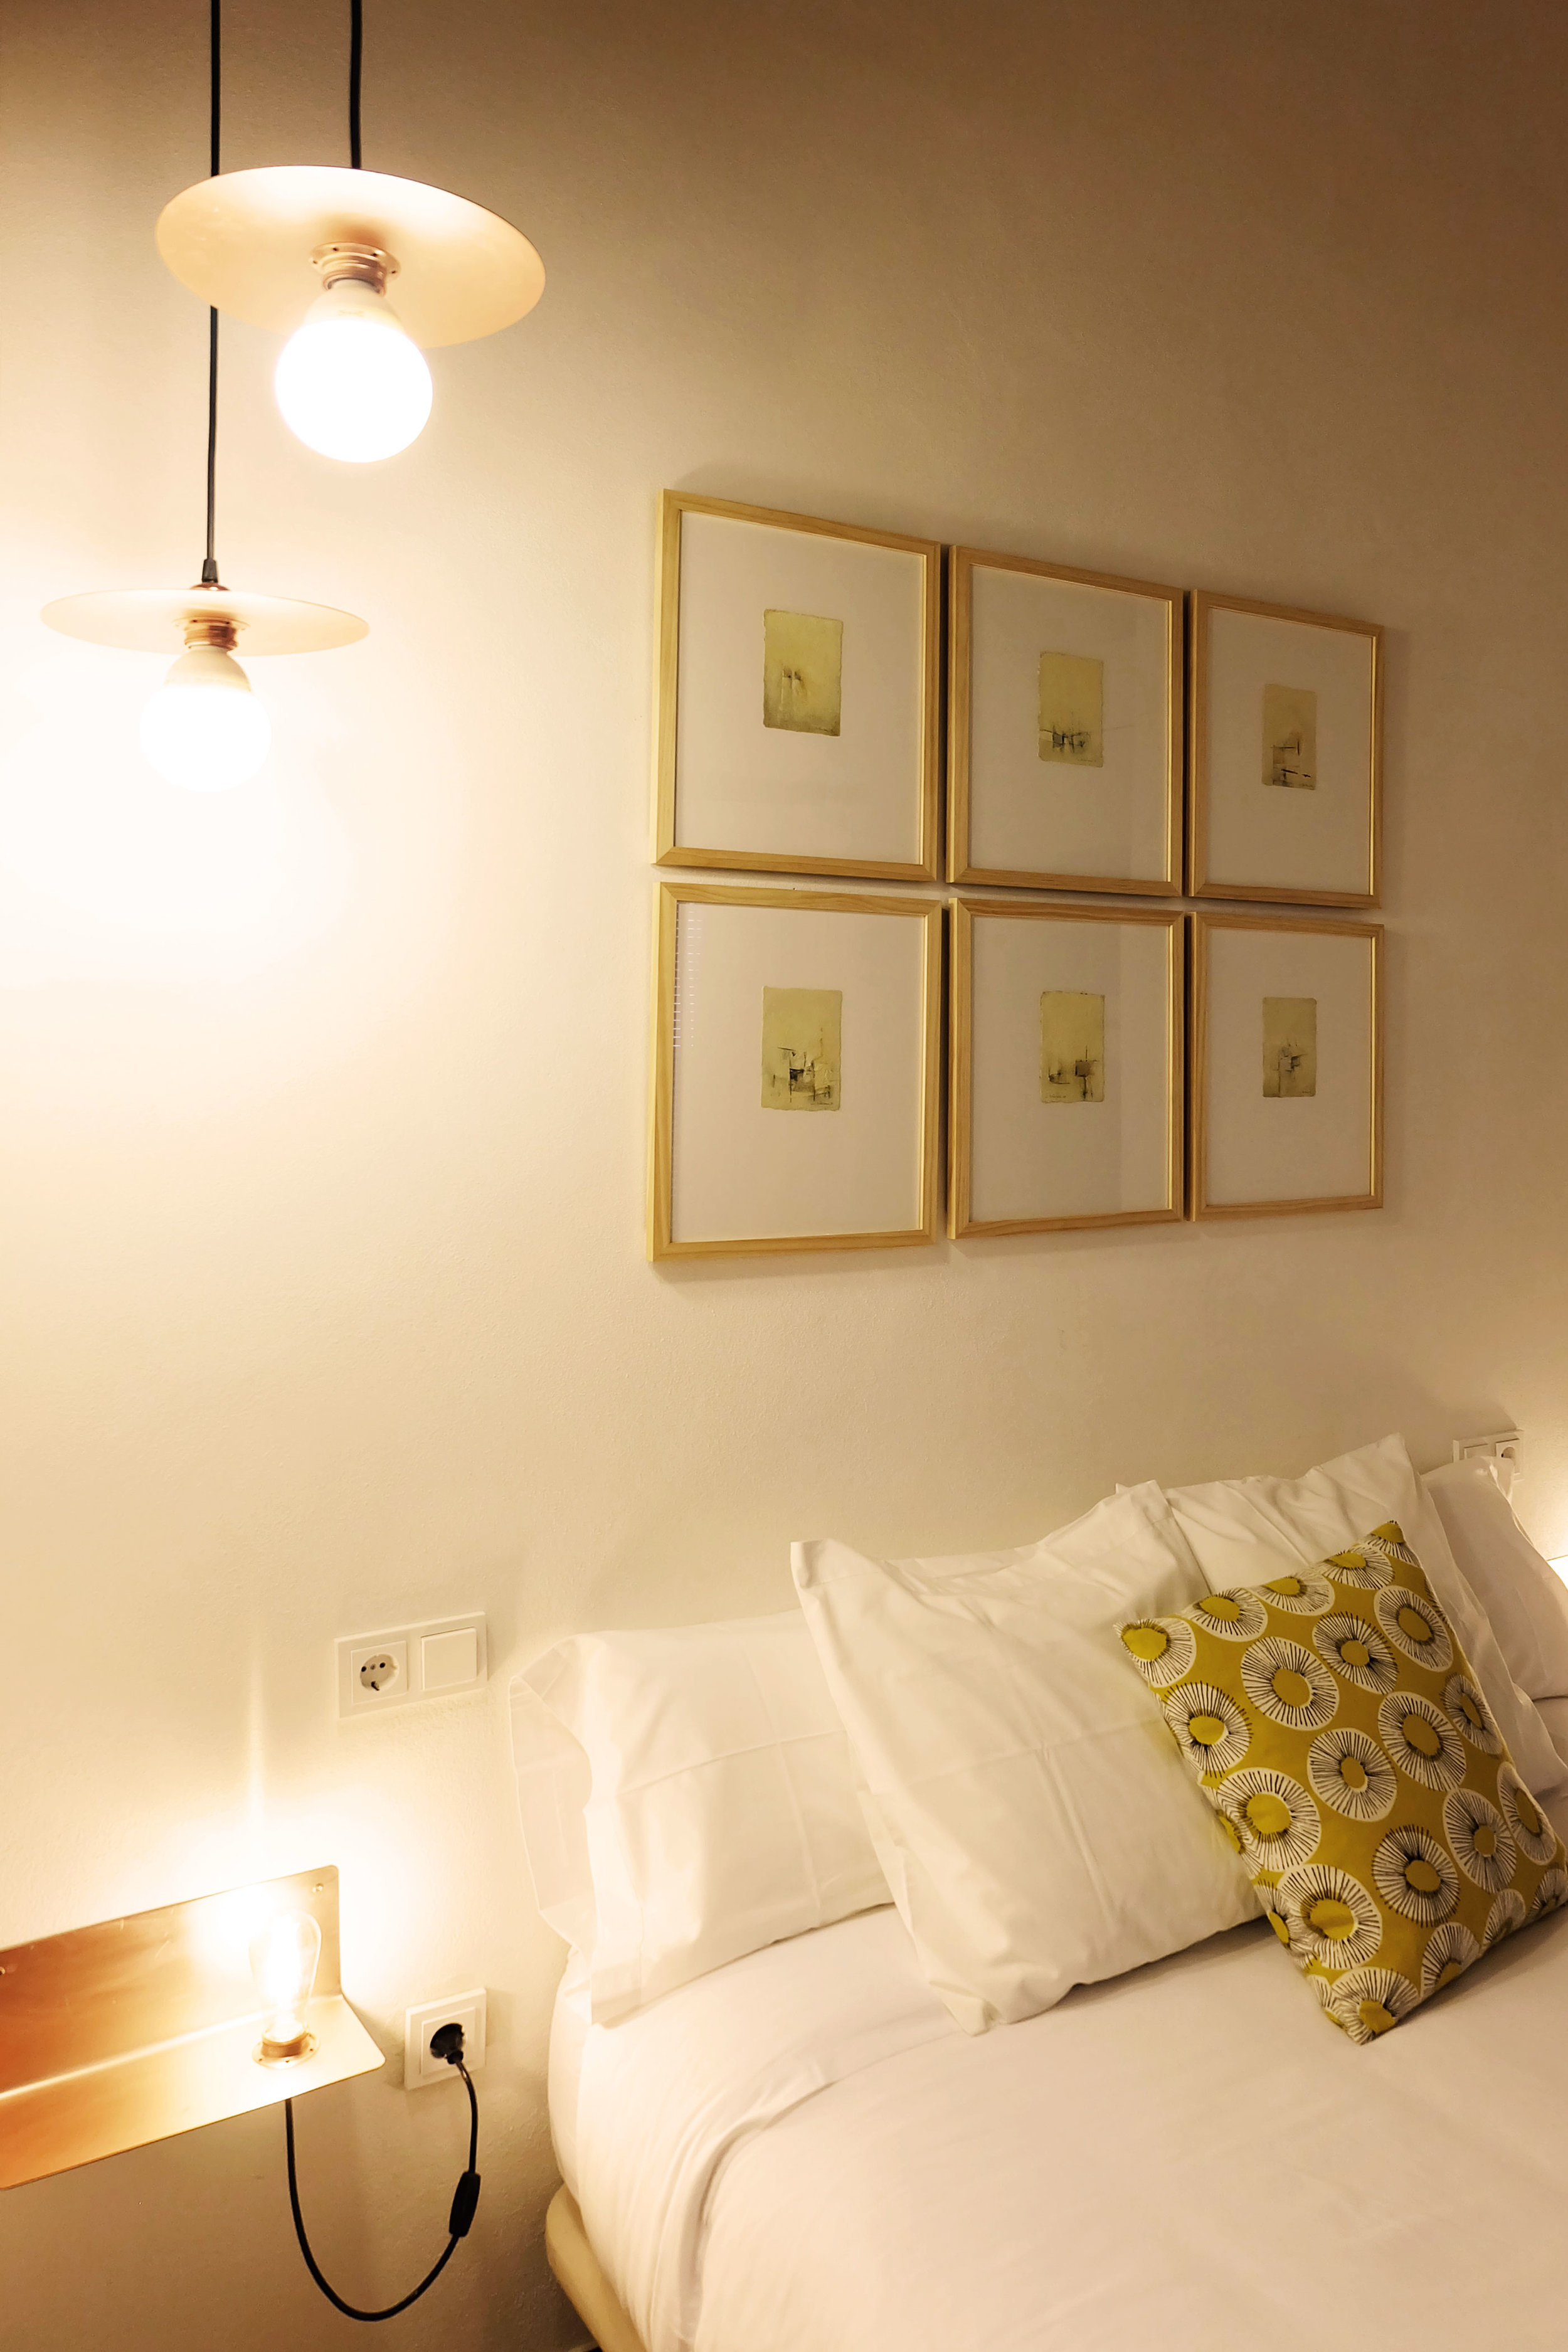 Hotel-Casa-de-Huespedes-Santa-Maria-Habitacion-10-11.jpg